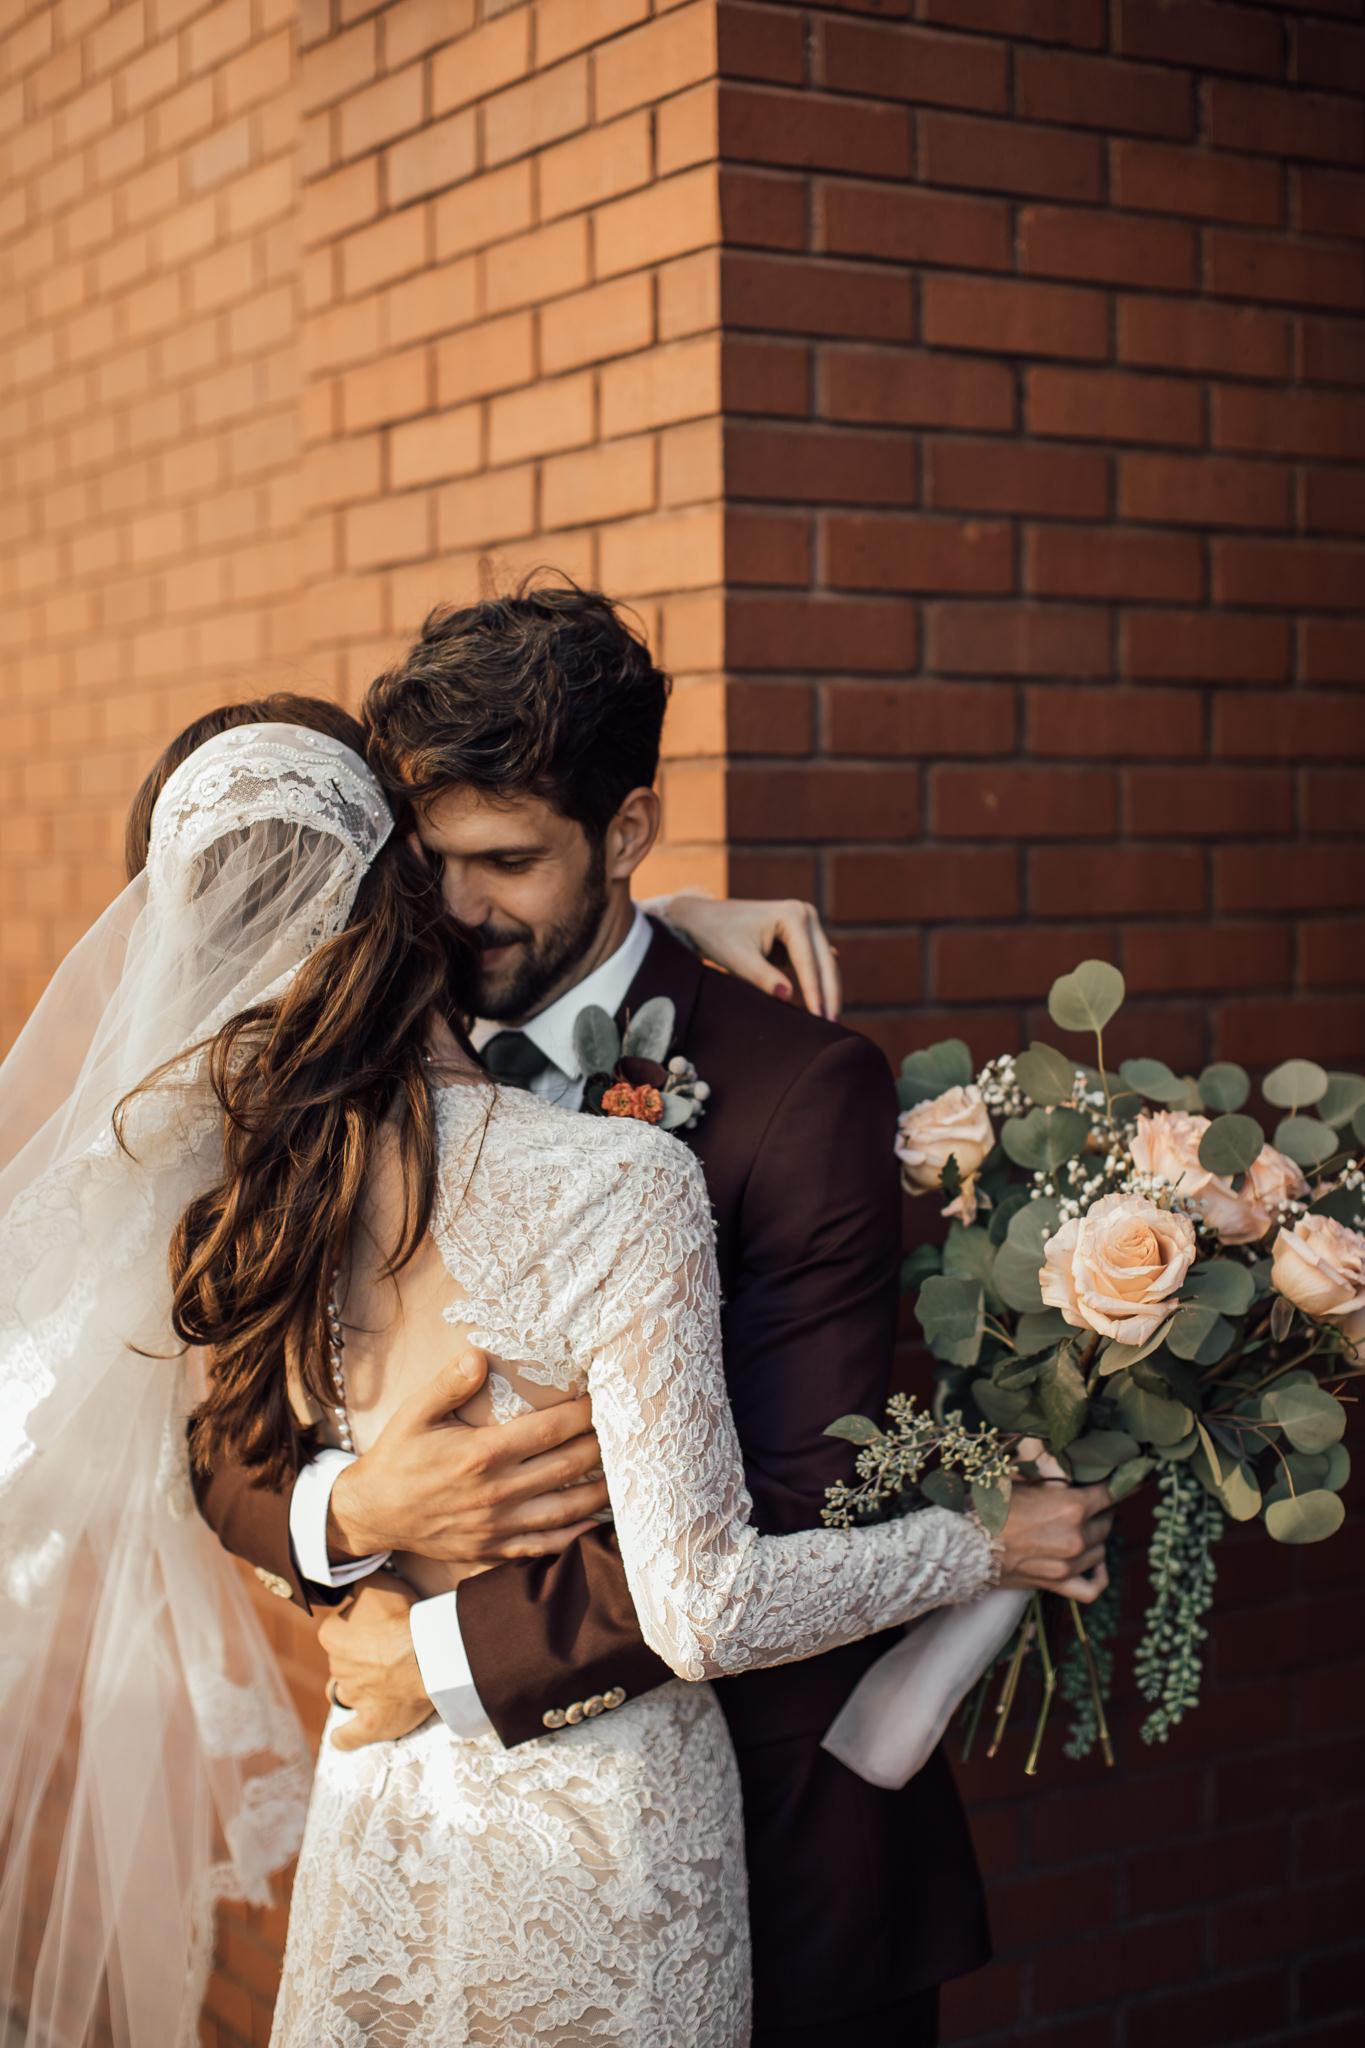 cassie-cook-photography-chattanooga-wedding-photographer-waterhouse-pavillion-cassie-matt-wedding-91.jpg